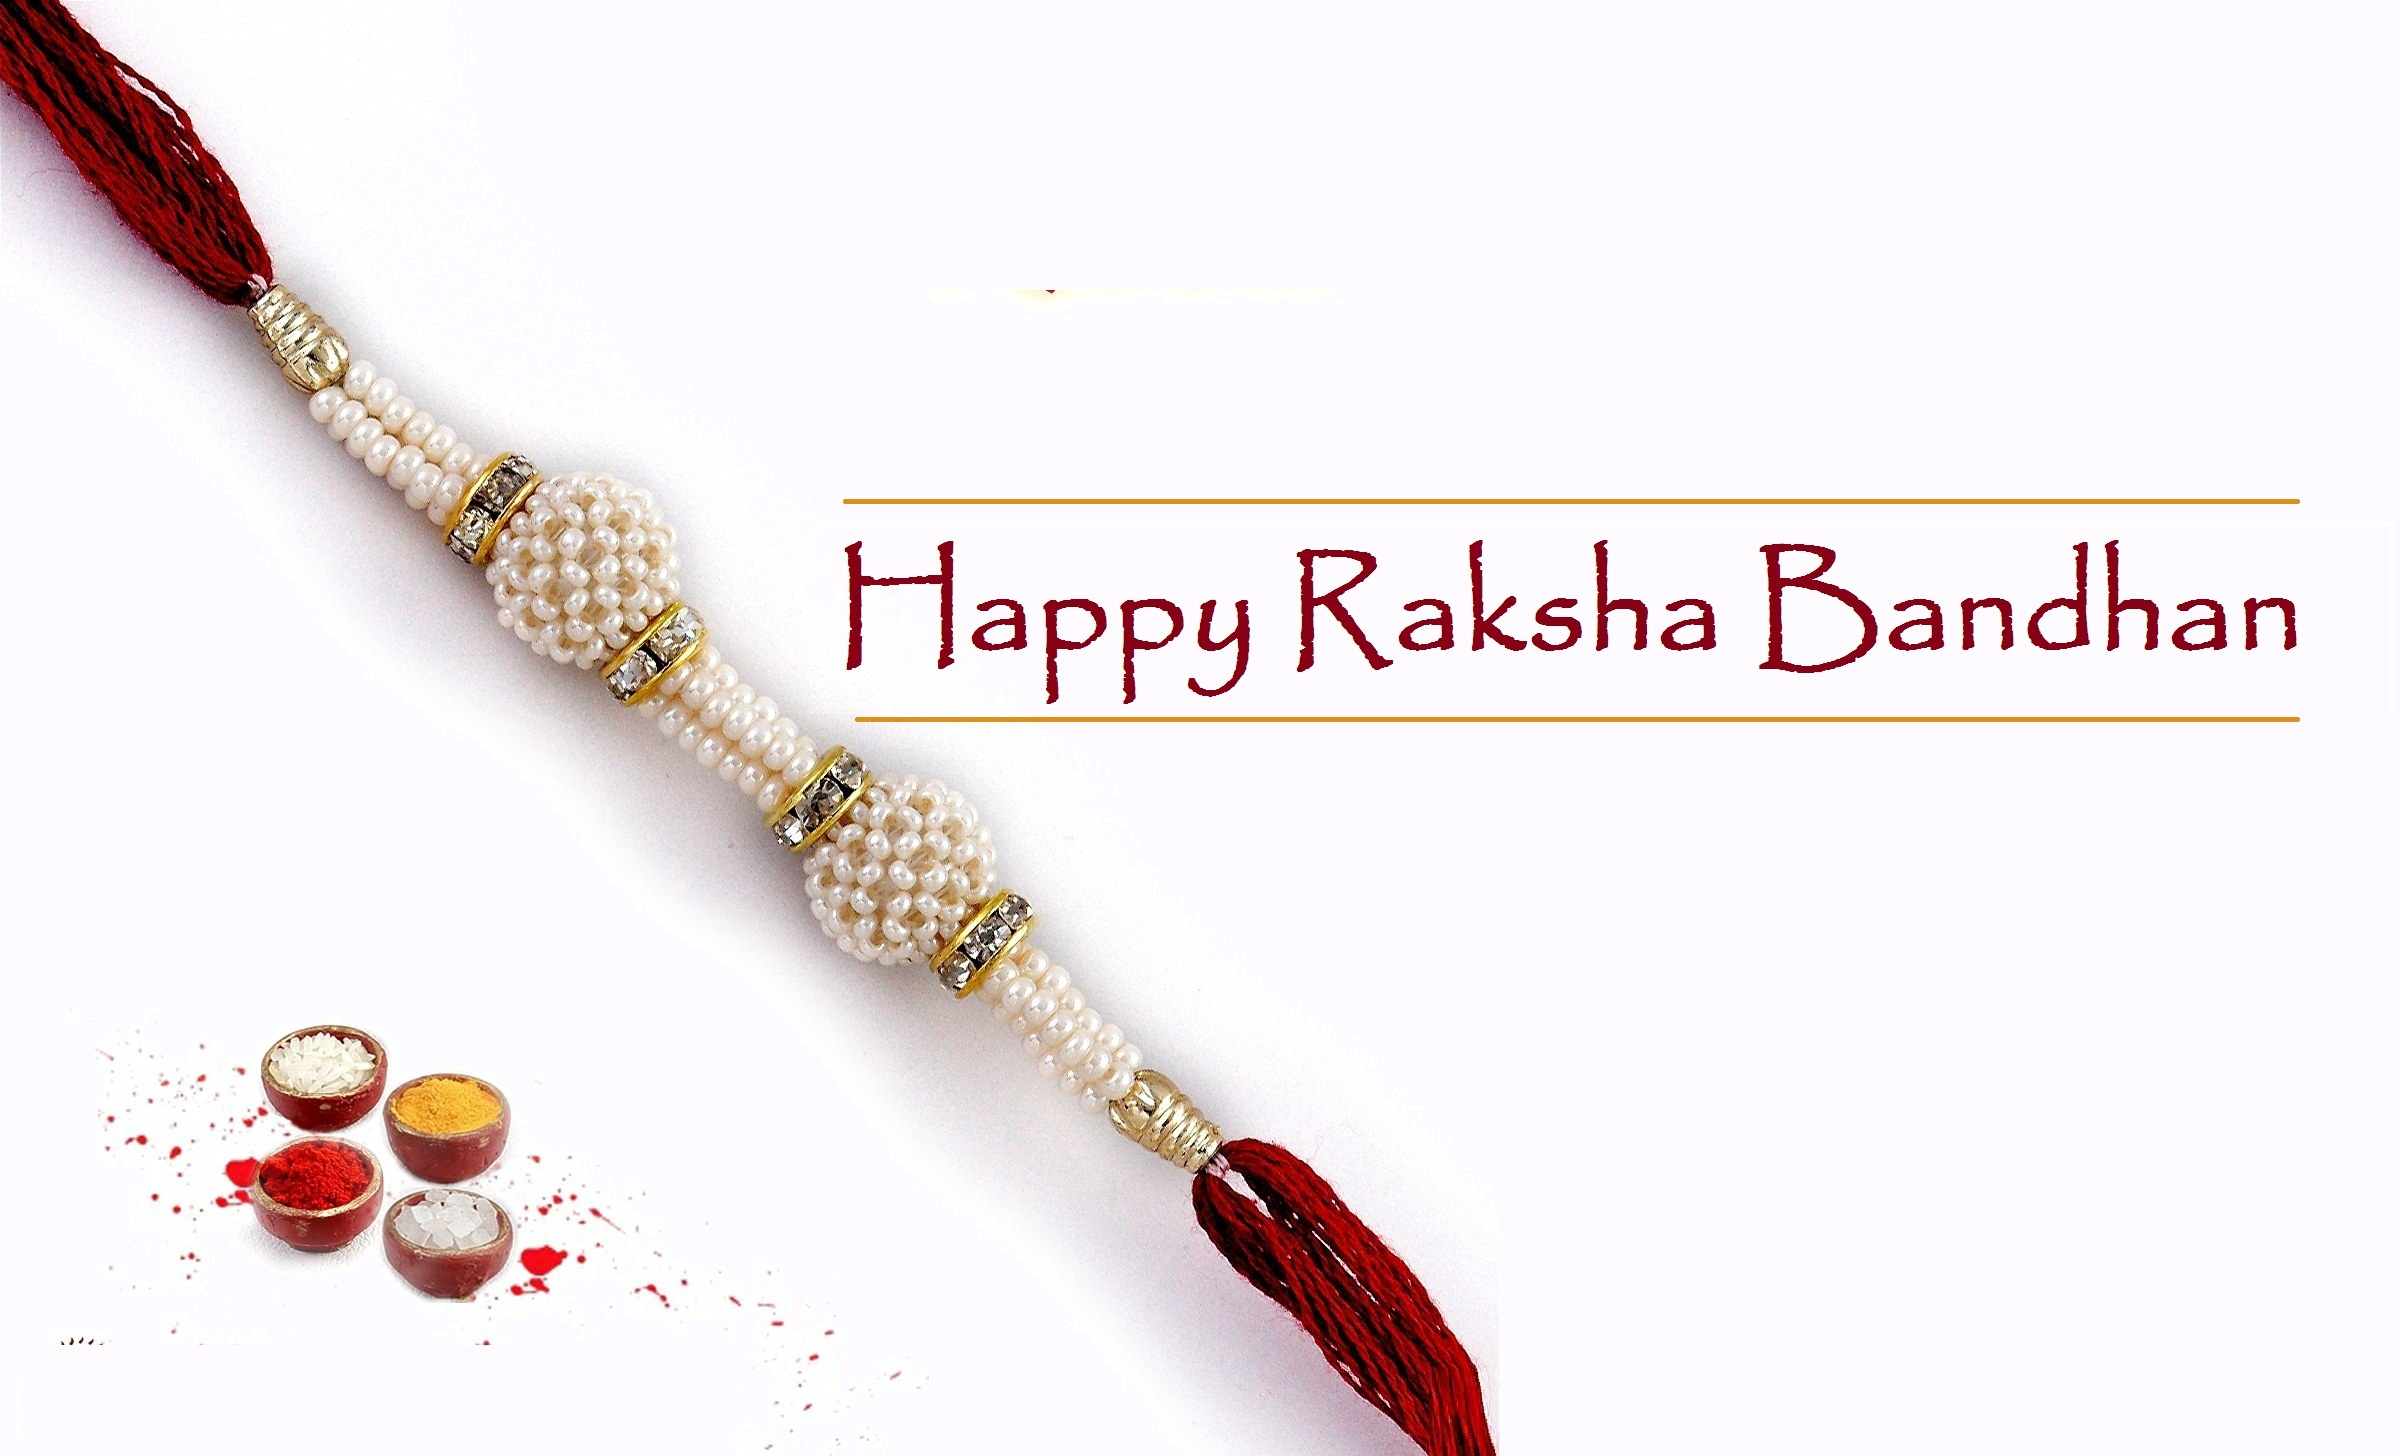 Download Wise Quotes Wallpapers Happy Raksha Bandhan Hd Images Amp Wallpapers Free